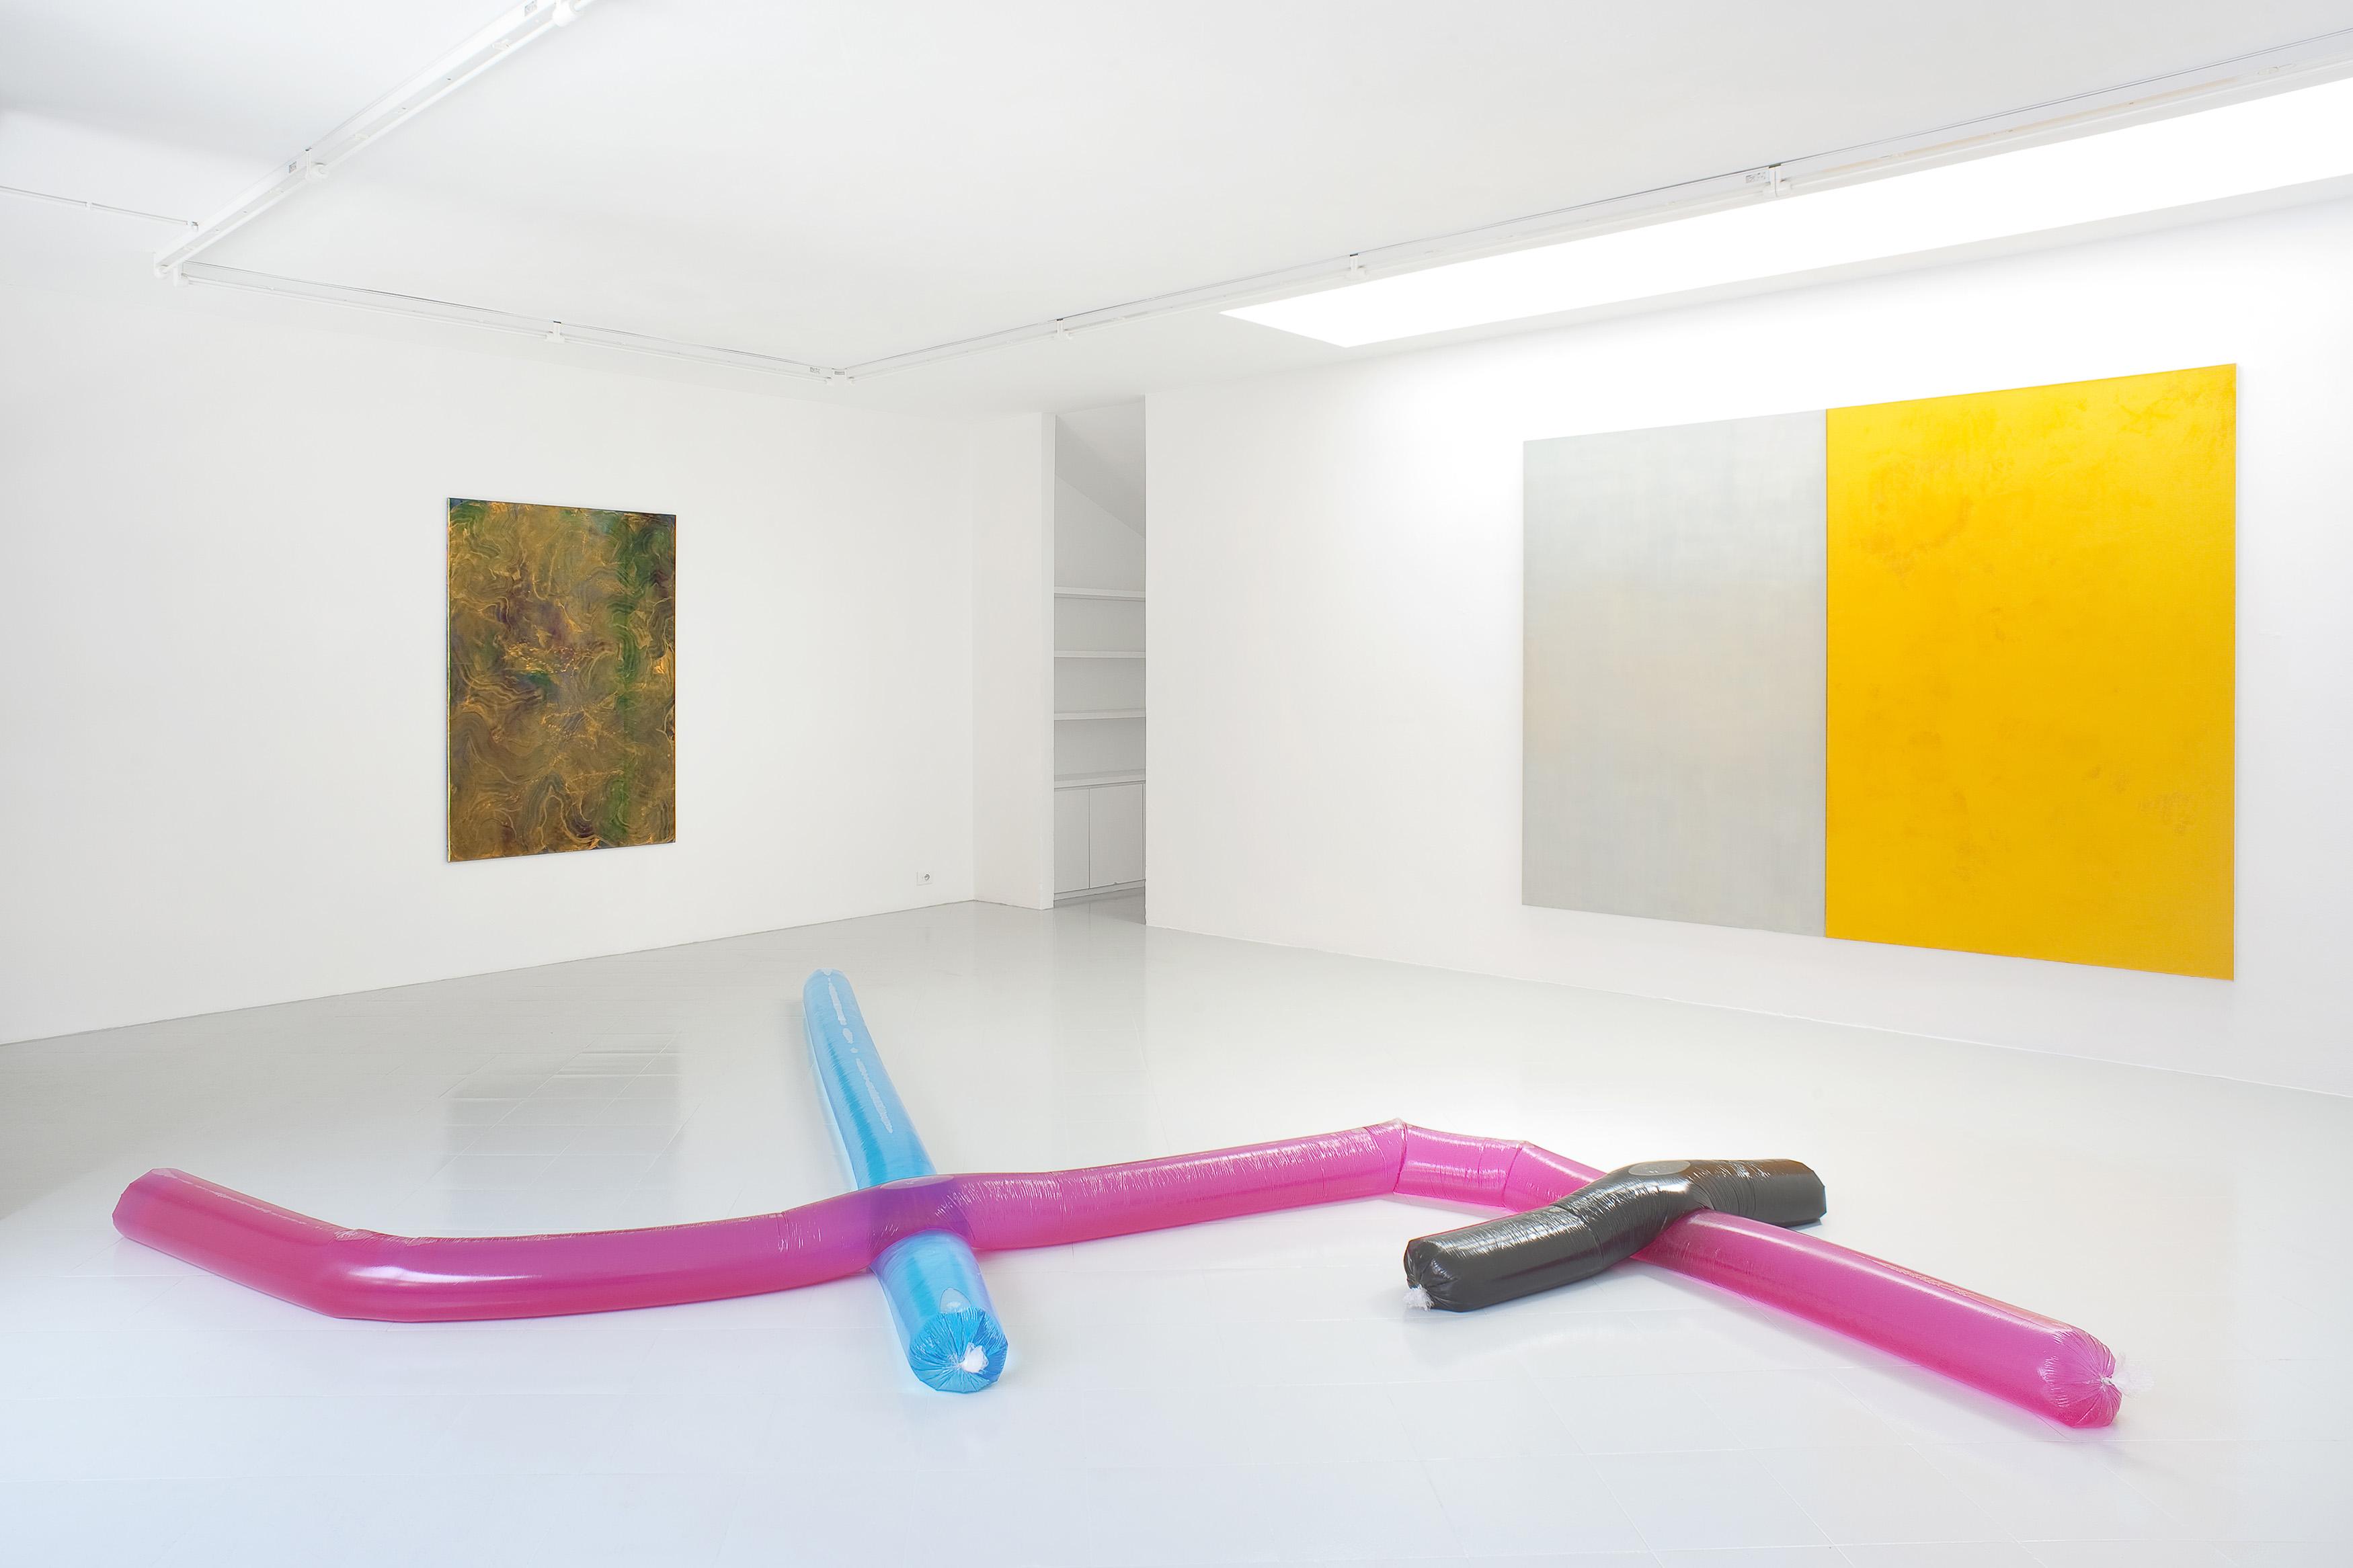 7 - Adrian Buschmann Mia Marfurt Henning Strassburger Tyra Tingleff Installation View 2015 - Courtesy Studiolo Milan Photo Filippo Armellin